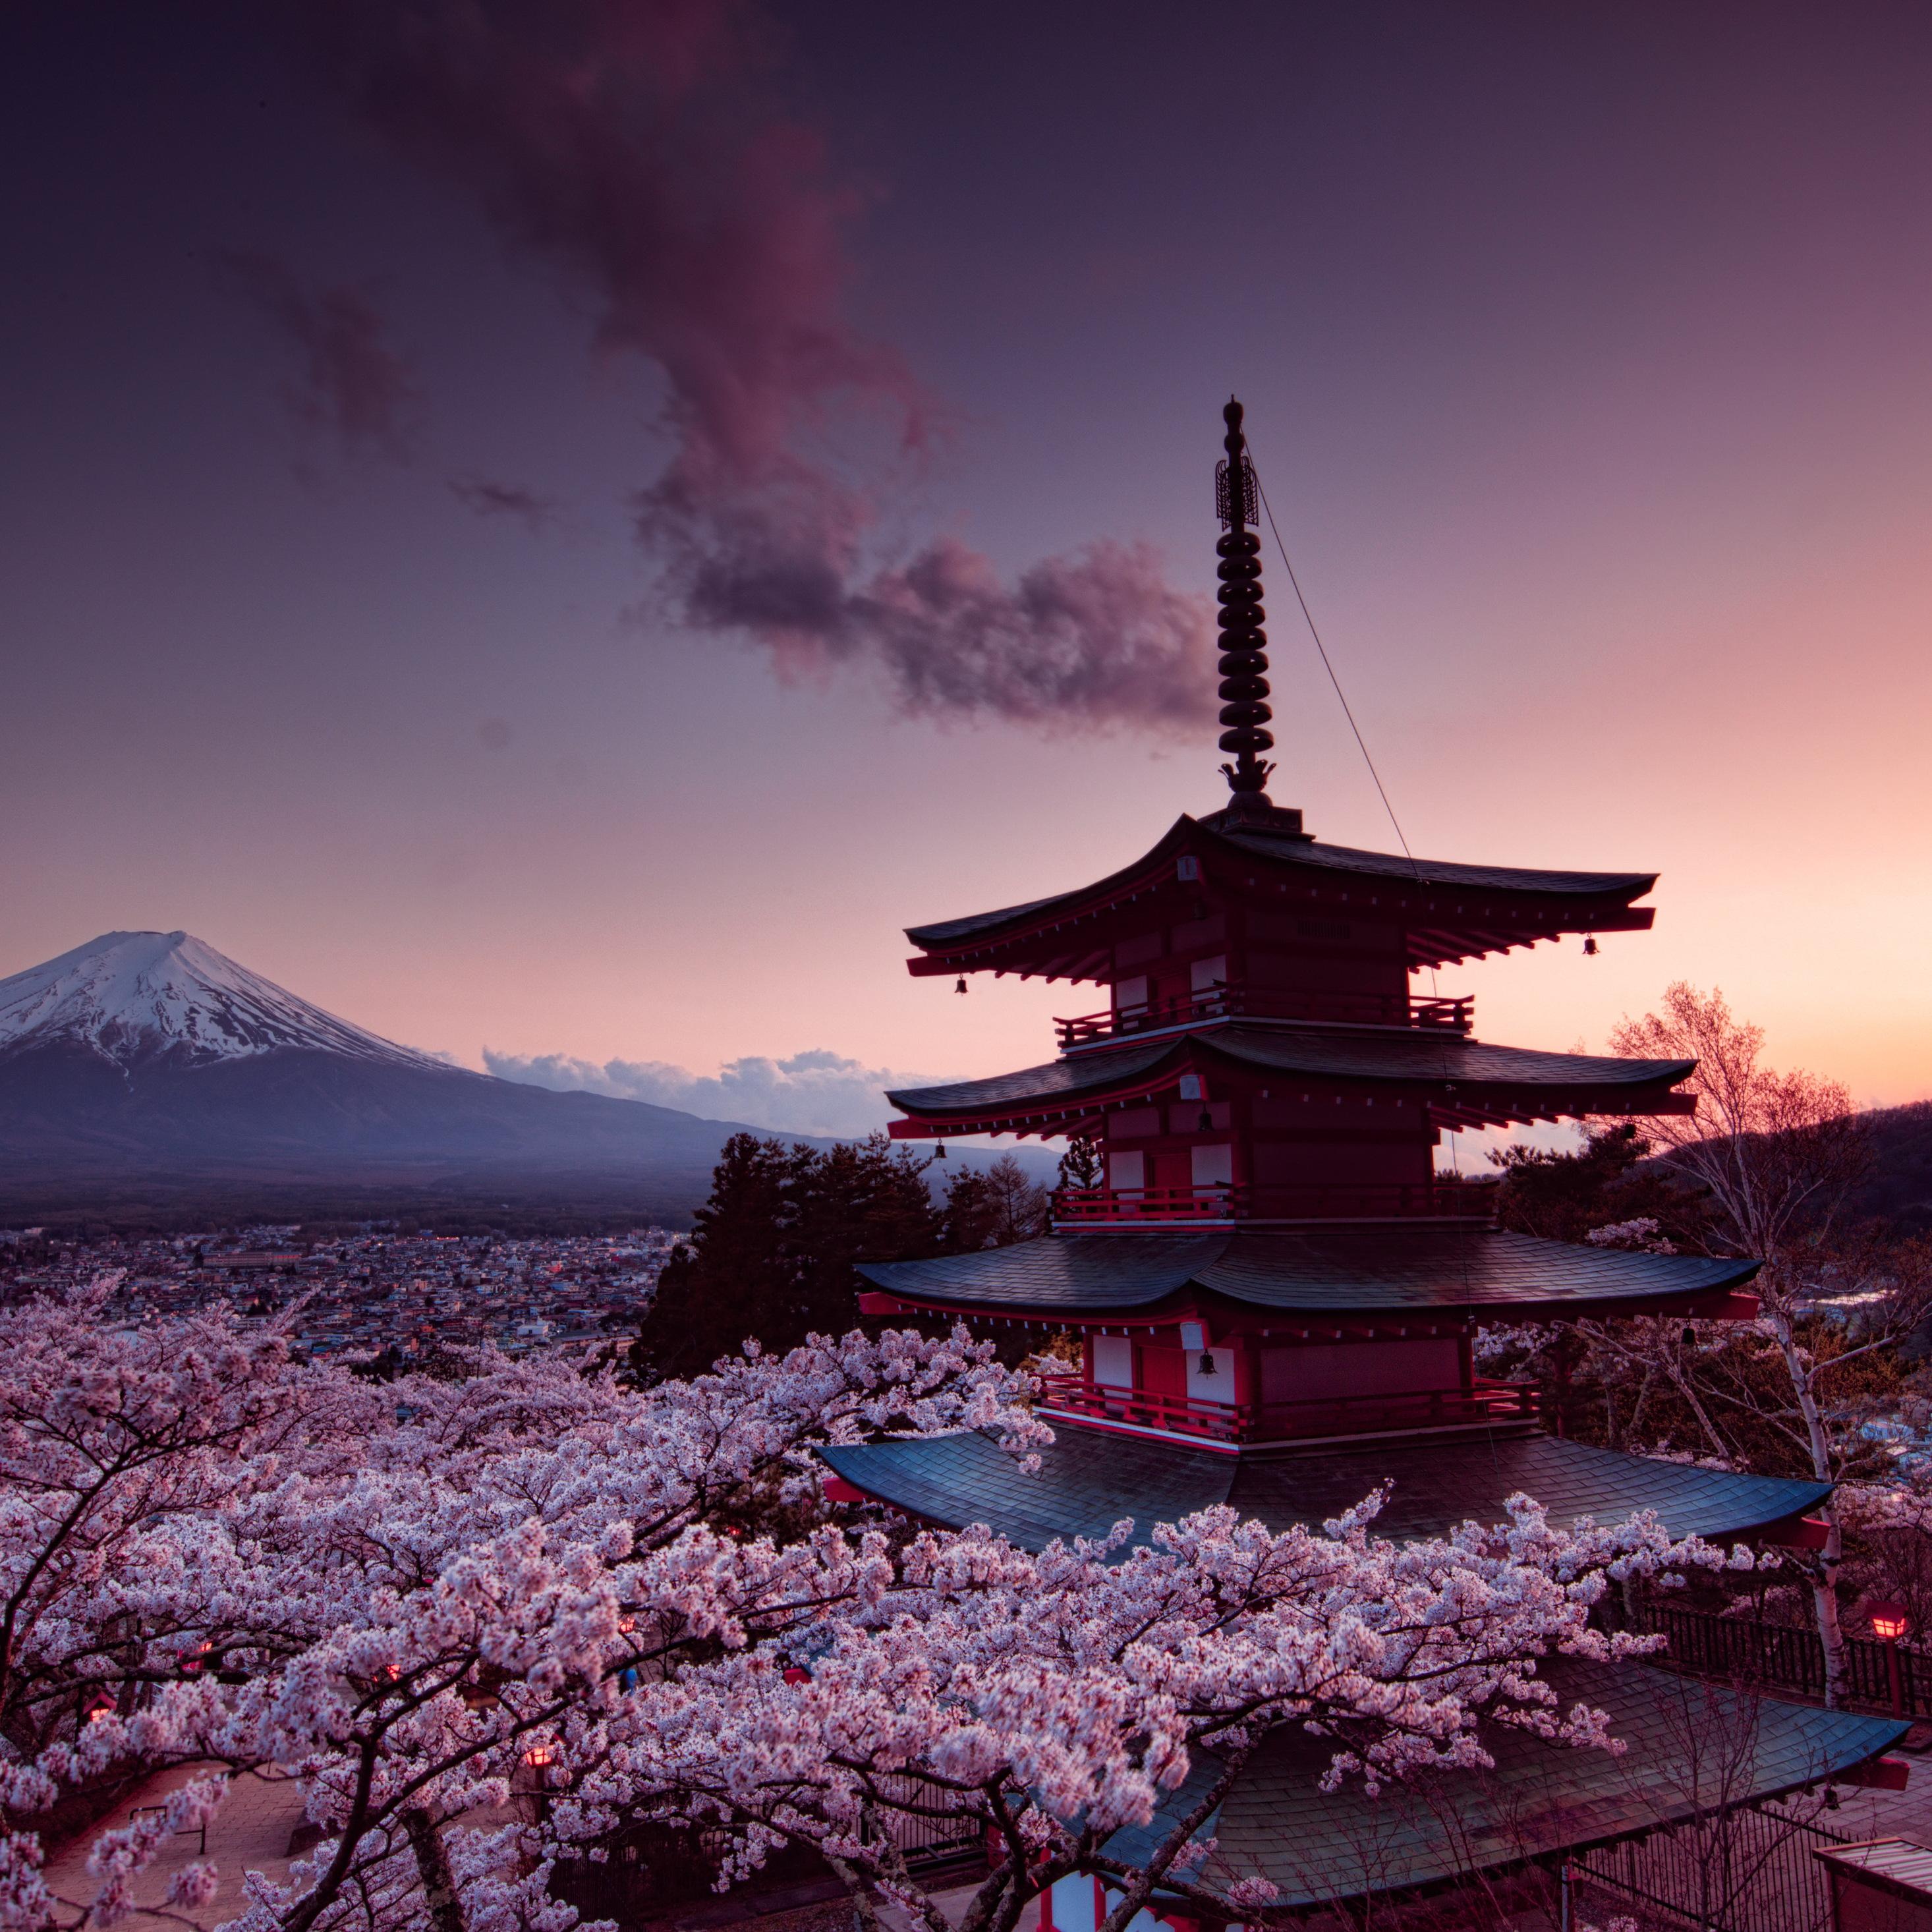 Mount Hd Wallpaper: 2932x2932 Churei Tower Mount Fuji In Japan 8k Ipad Pro